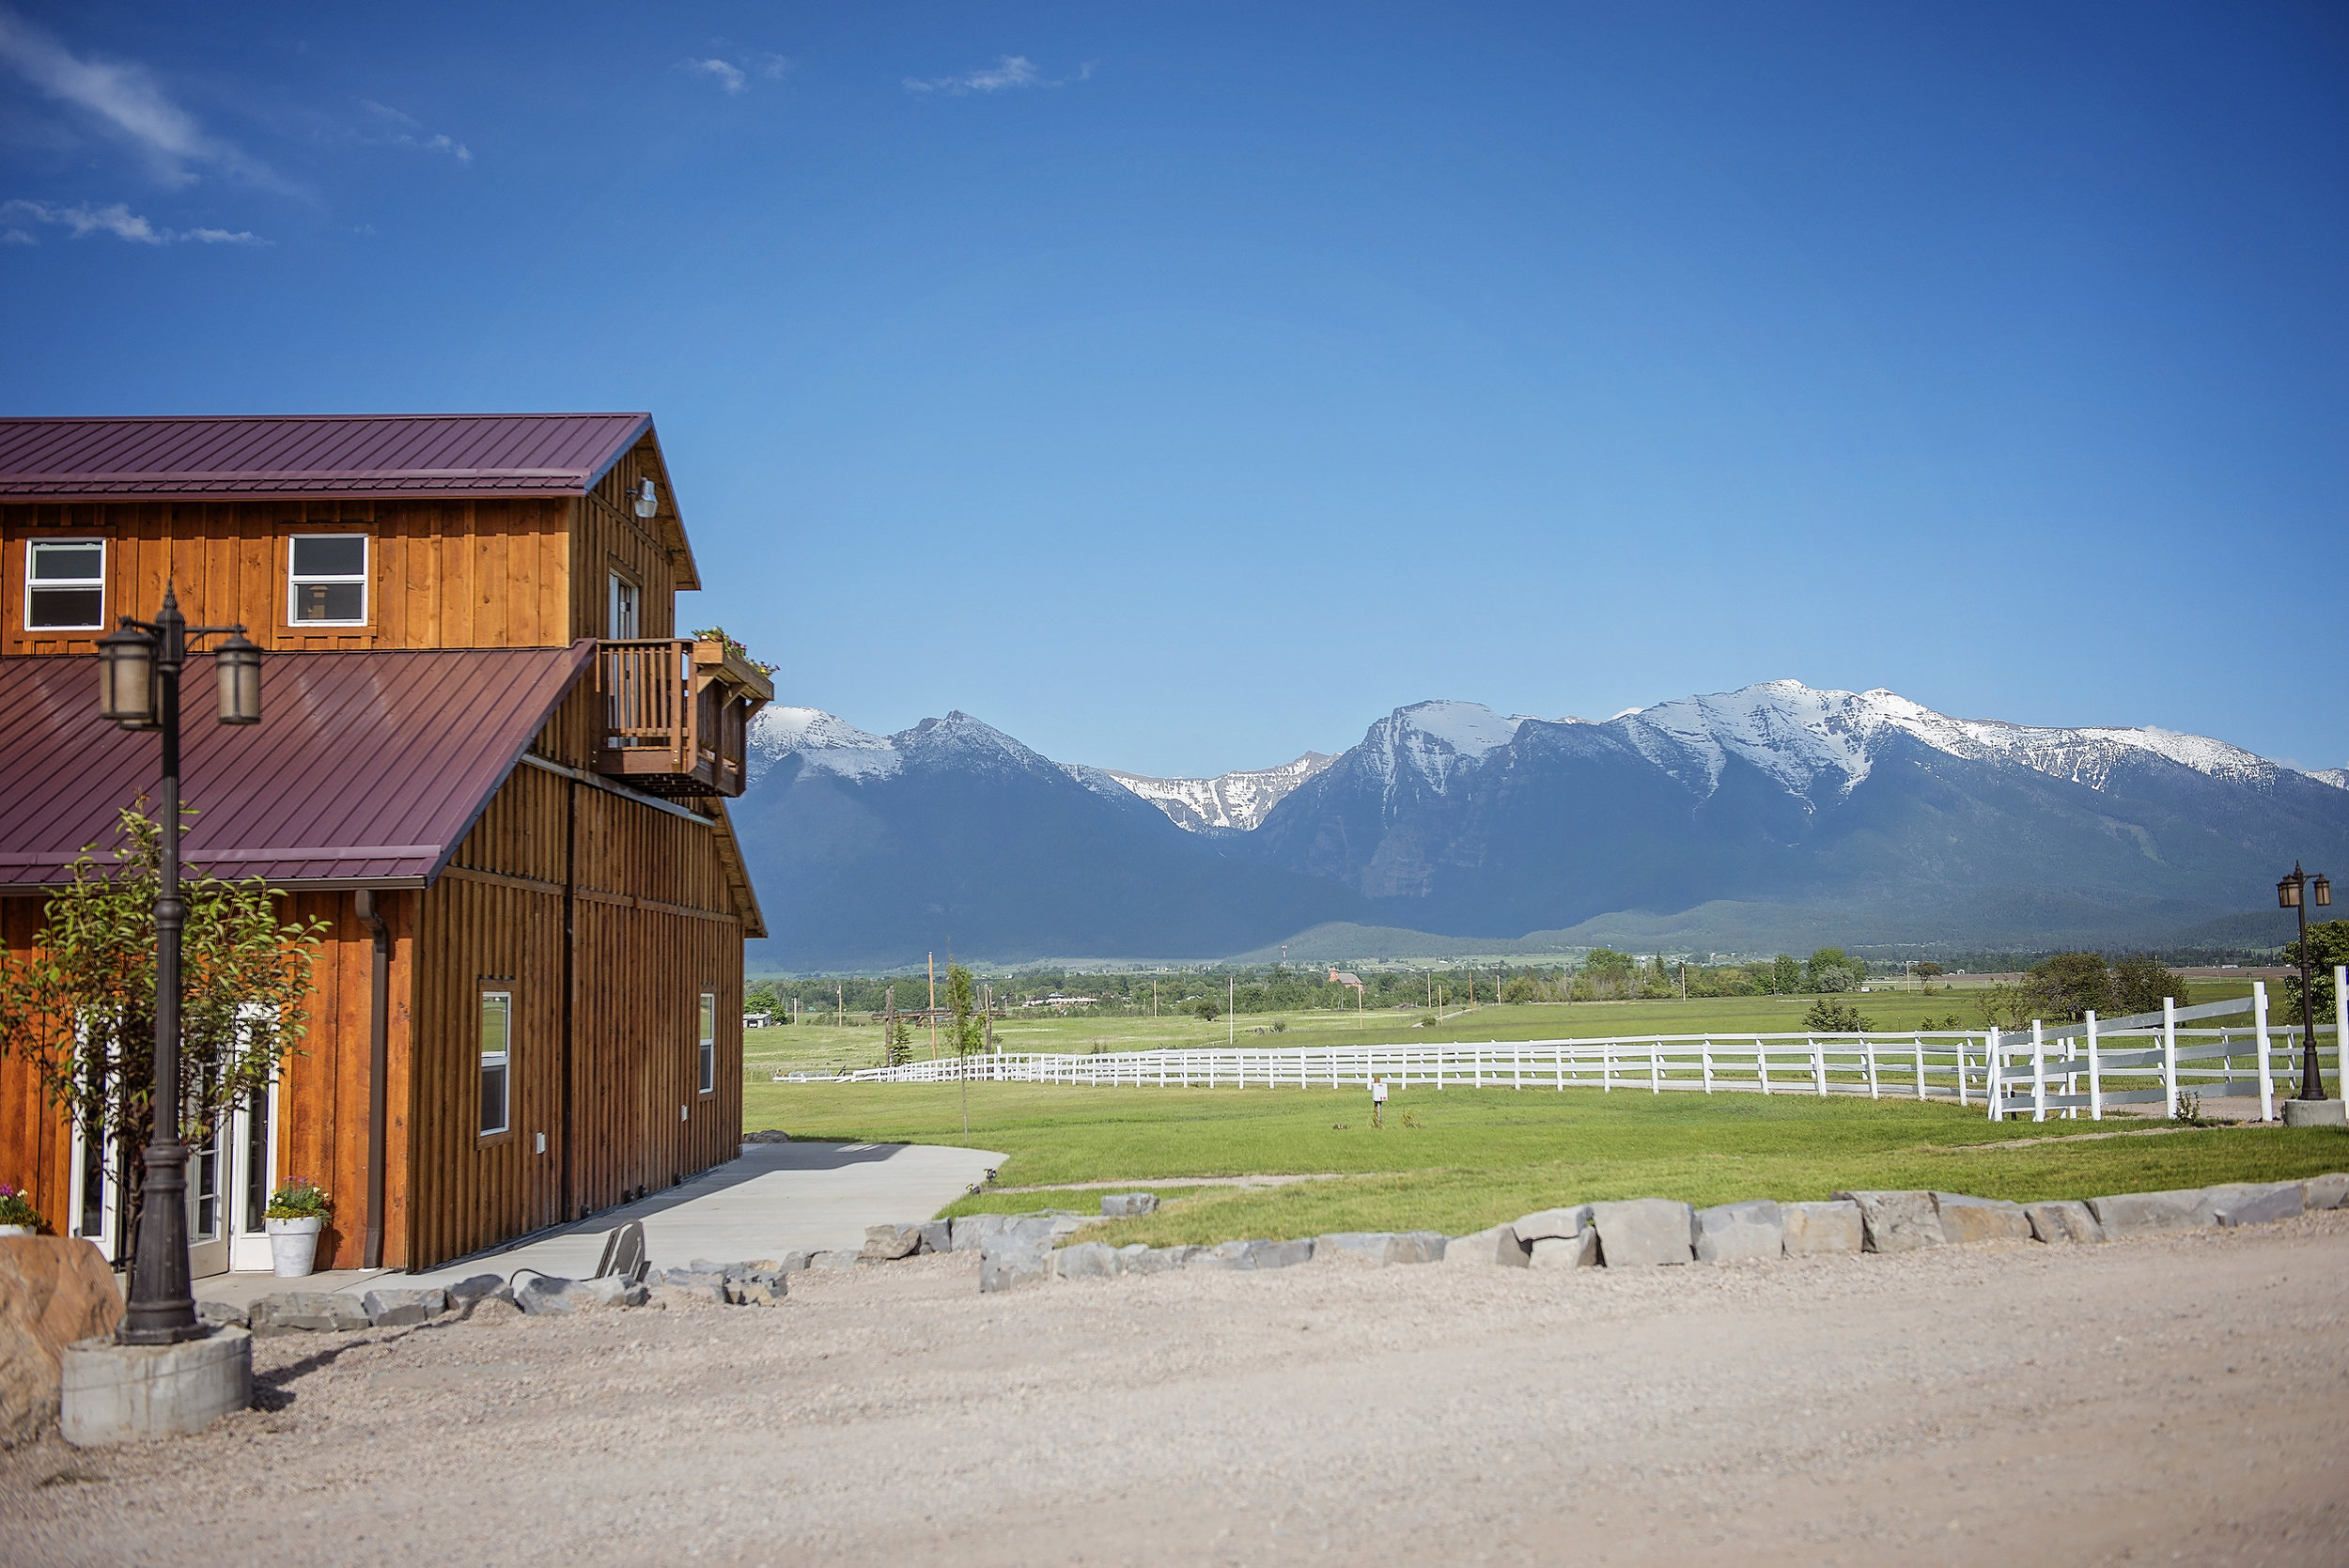 Barn Wedding with a View at Rugged Horizon